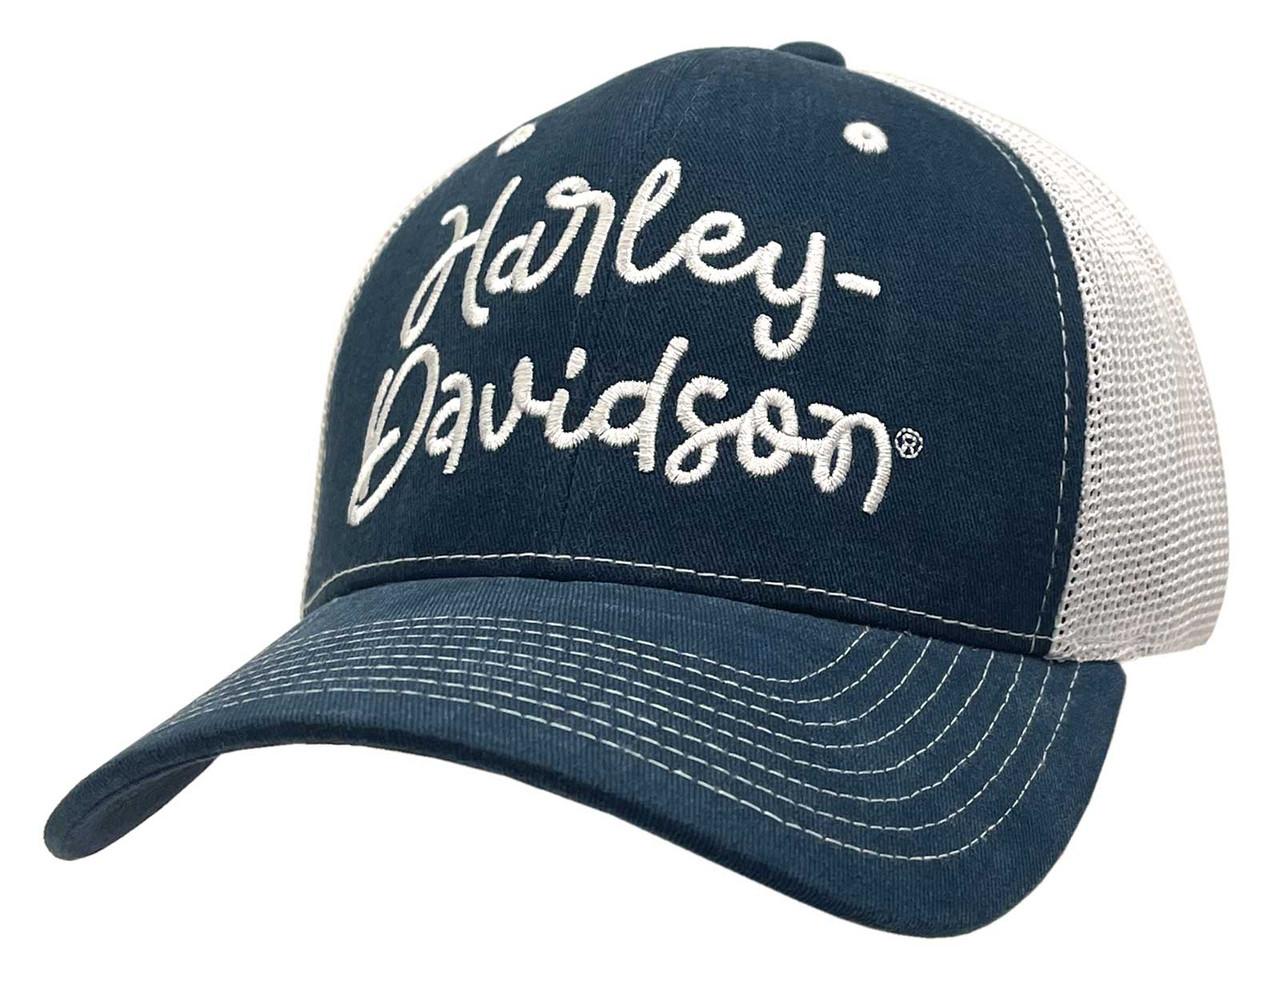 8d58ba3958f5c5 Harley-Davidson Women's Embroidered Harley Script Baseball Cap, Navy  BC28685 - Wisconsin Harley-